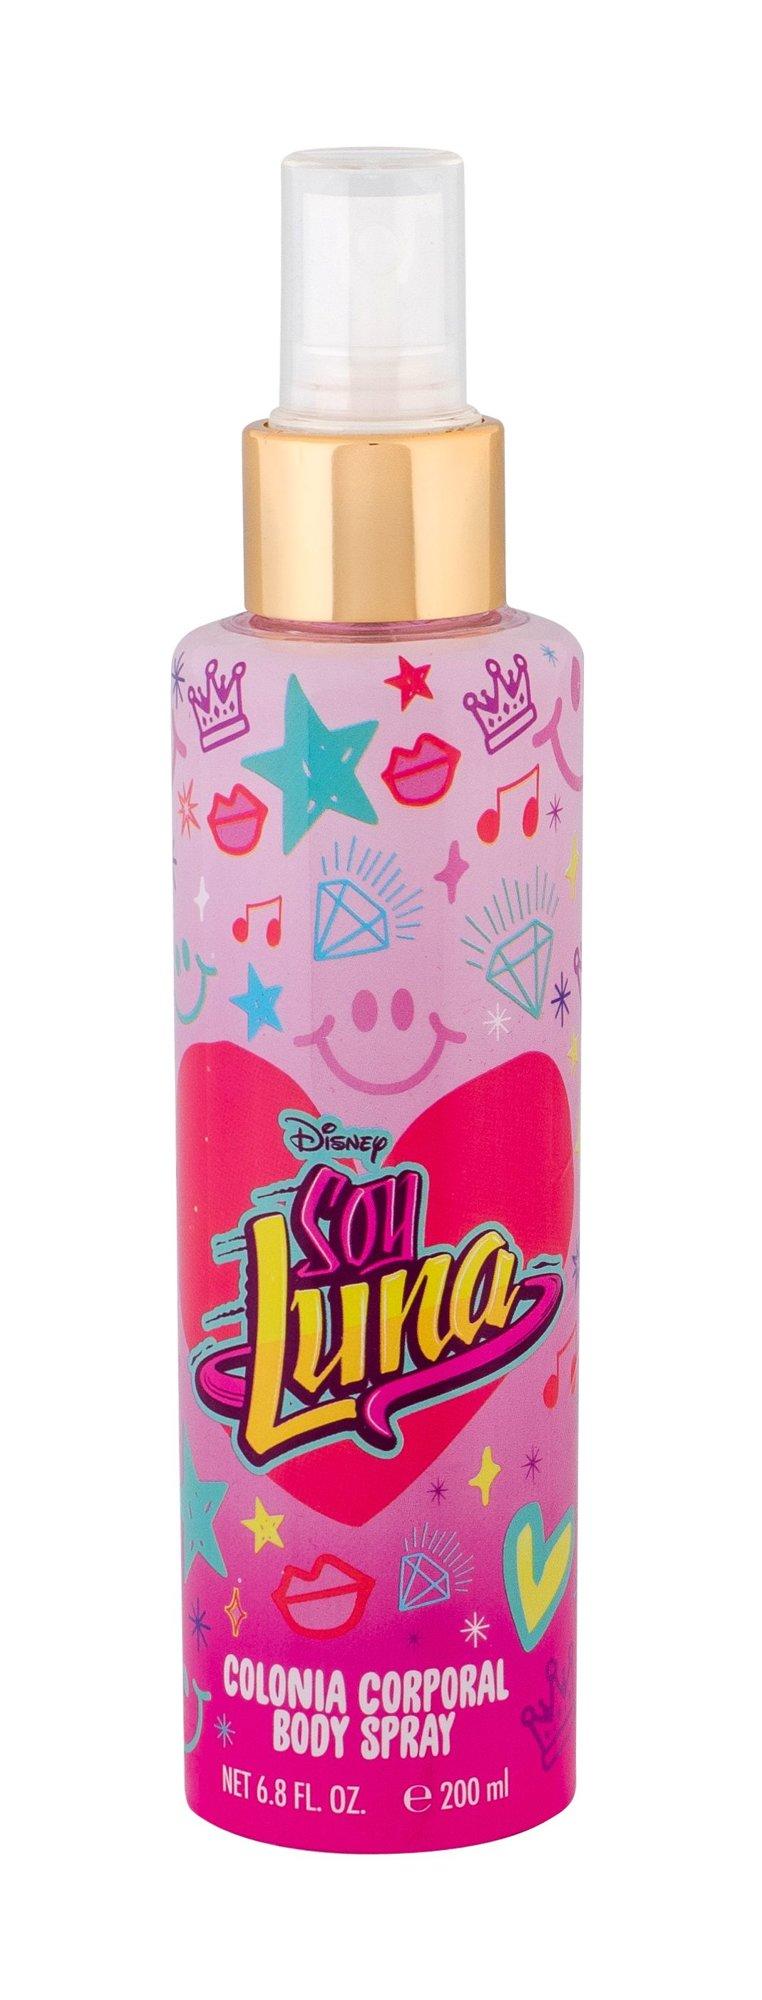 Disney Soy Luna Body Spray 200ml